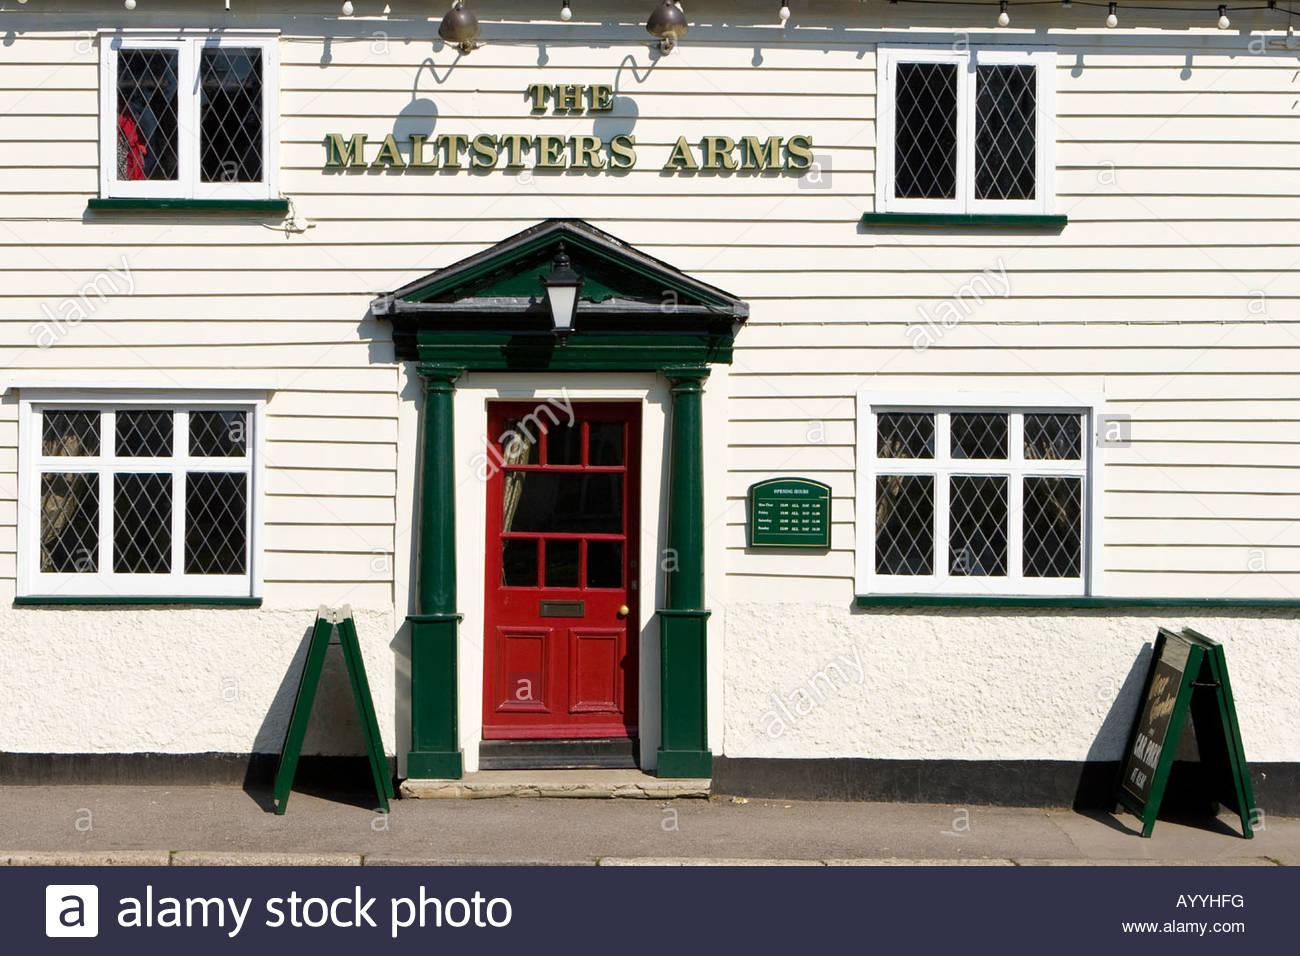 The ^Maltsters Arms public house, Abridge, Essex, UK. - Stock Image